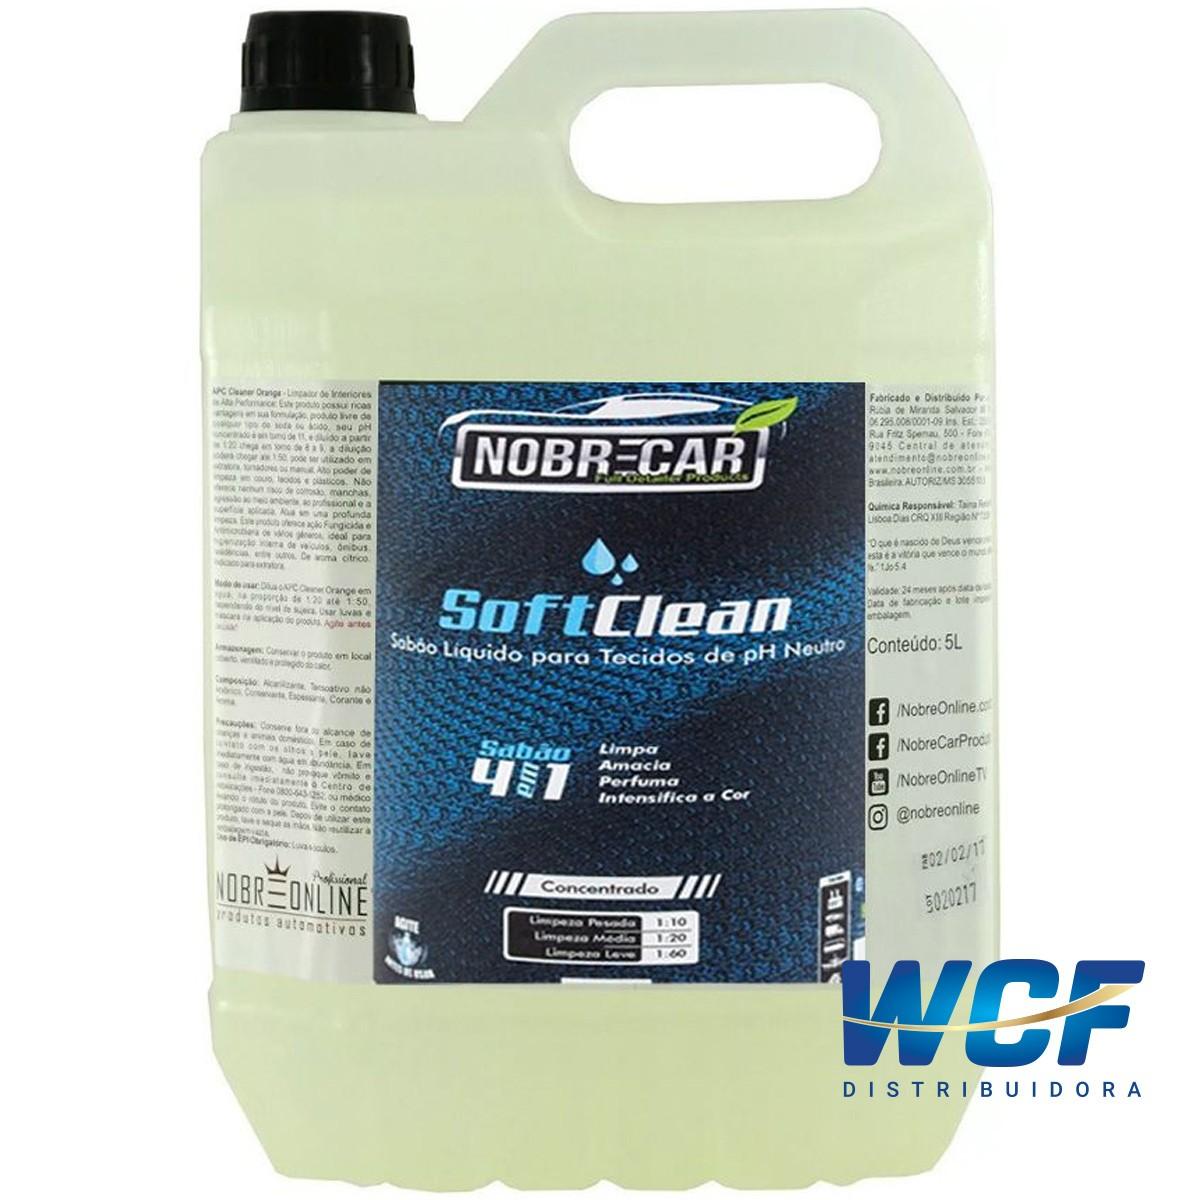 NOBRE SOFT CLEAN LIMPA CONDICIONA TECIDOS GALAO 5 LITROS